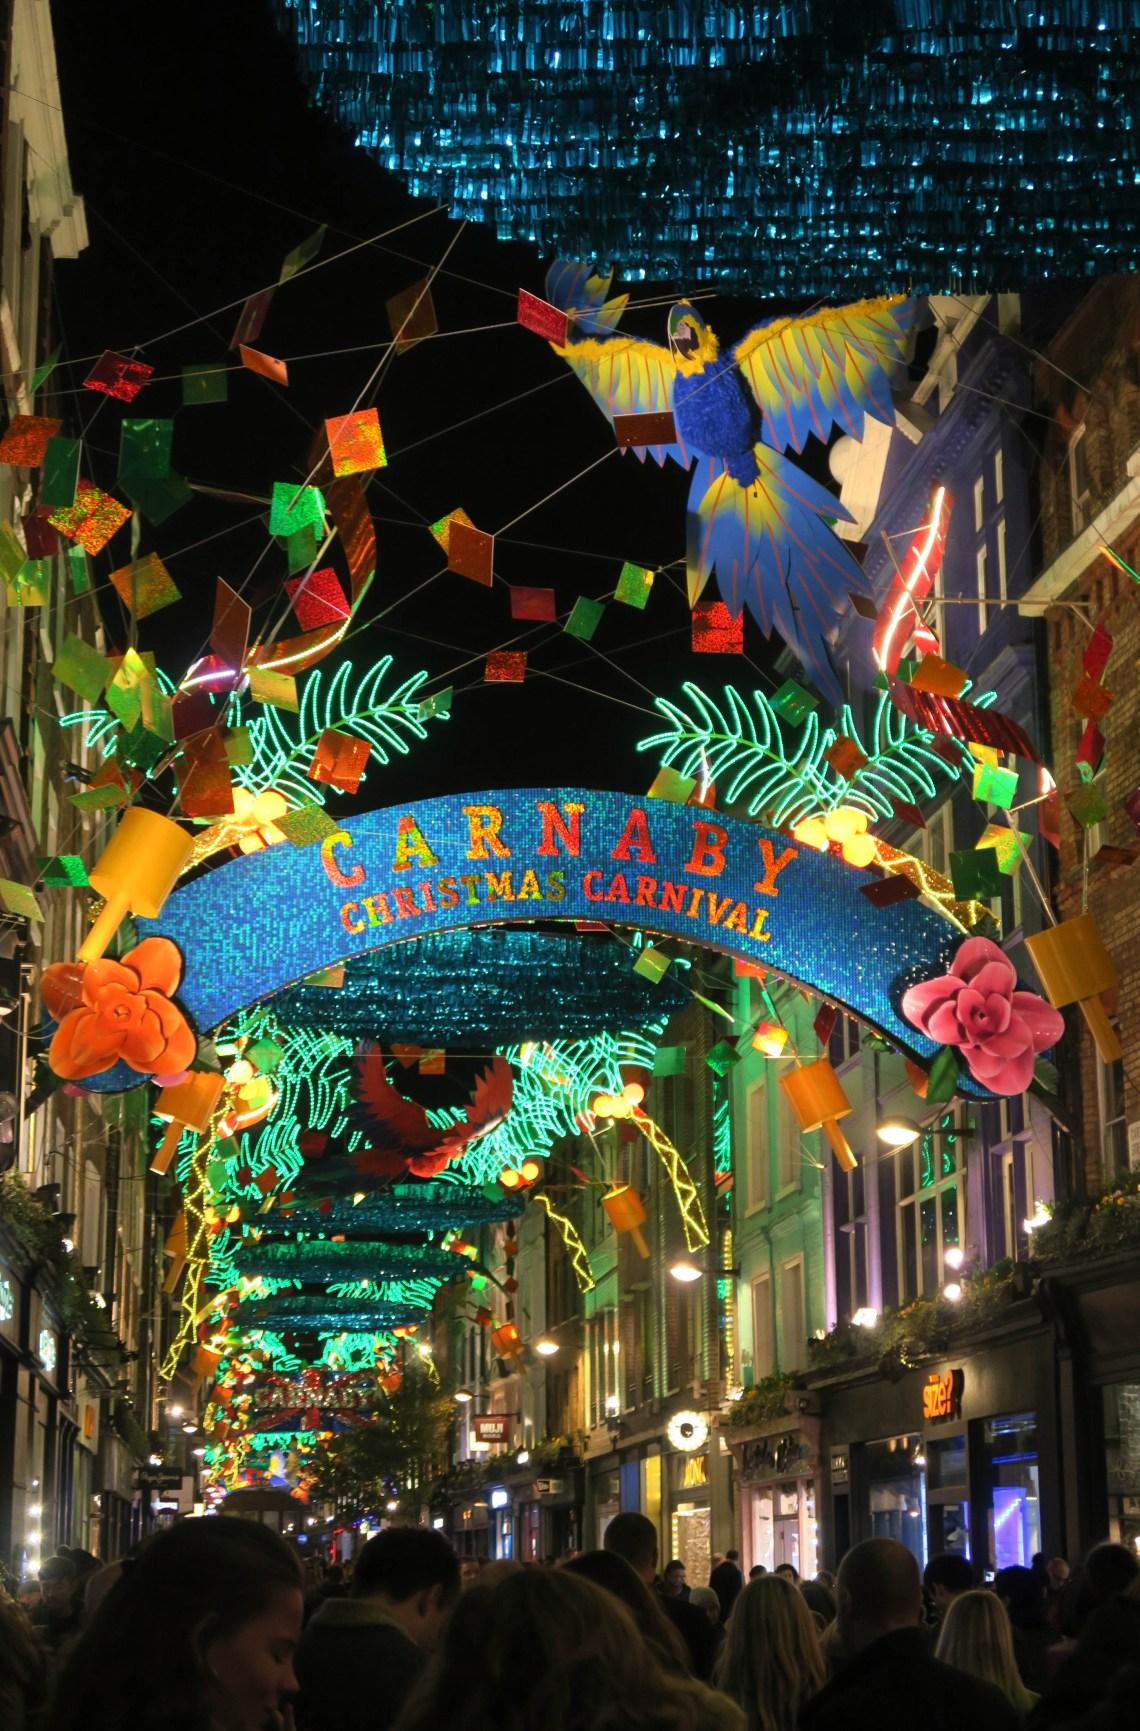 carnaby street - londres - inglaterra